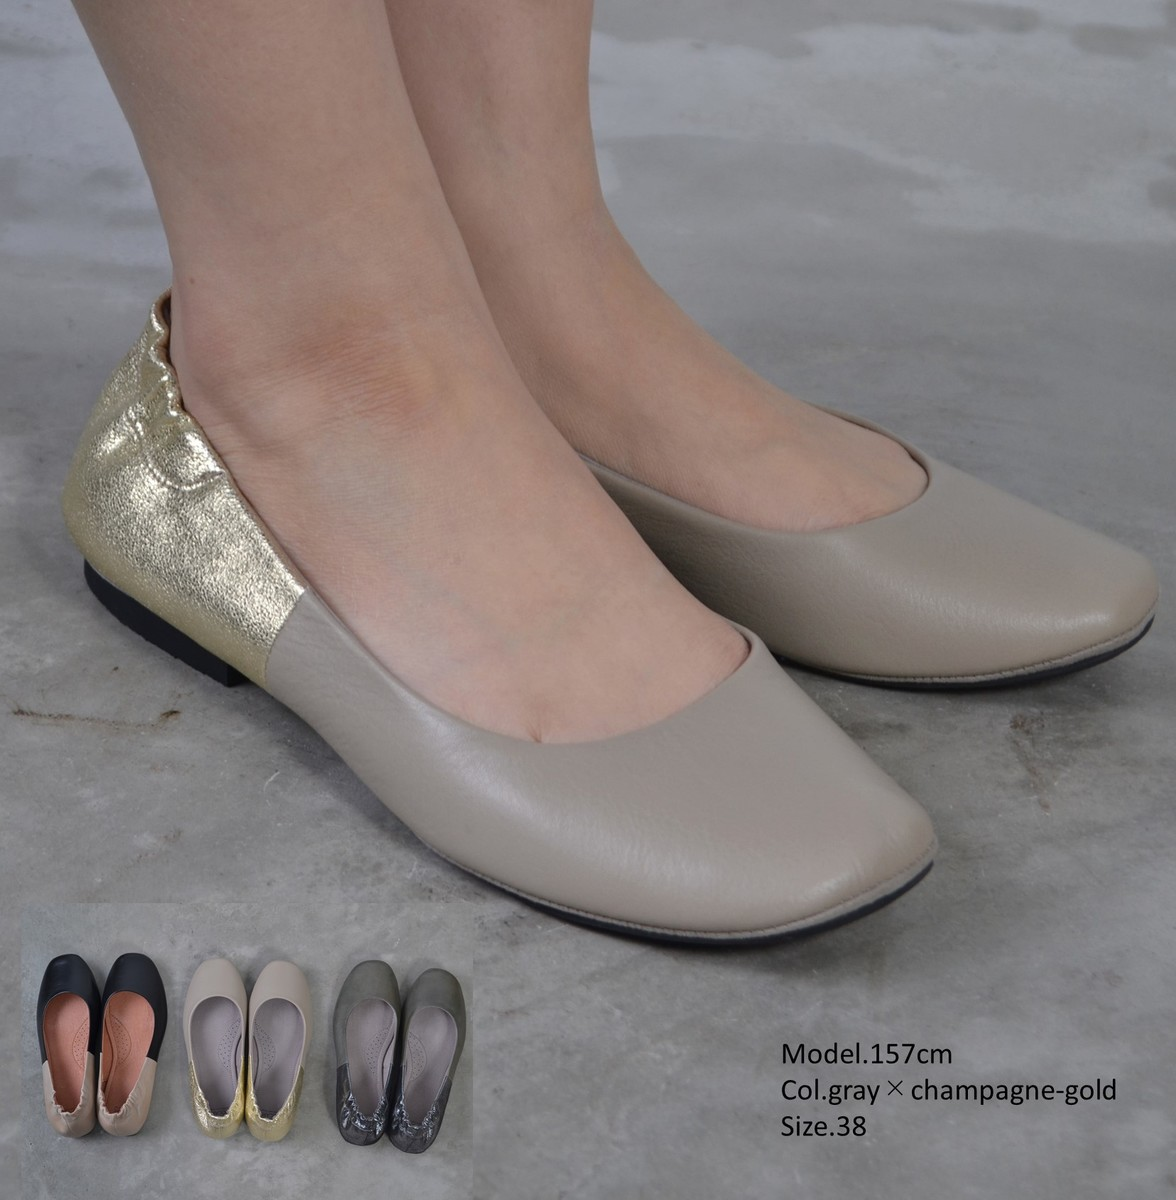 VOLARE ヴォラーレ 配色レザーフラットシューズ TWO TONE two-tone 送料無料 レディースファッション レザーシューズ 靴 再入荷 フォーマル オケージョン